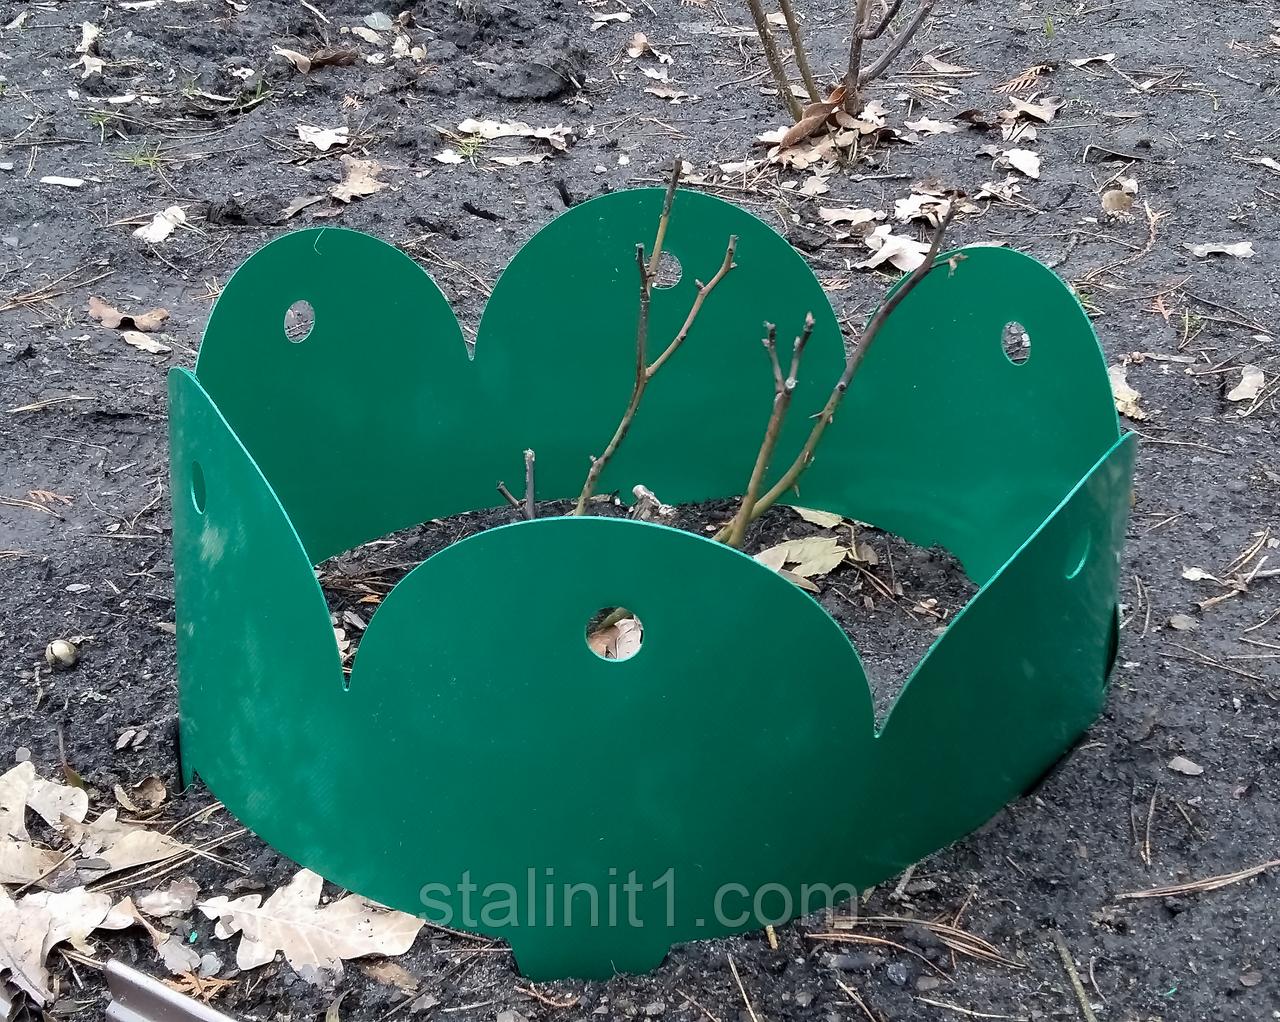 Забор-бордюр для клумб декоративный секционный, пластик, Стандарт